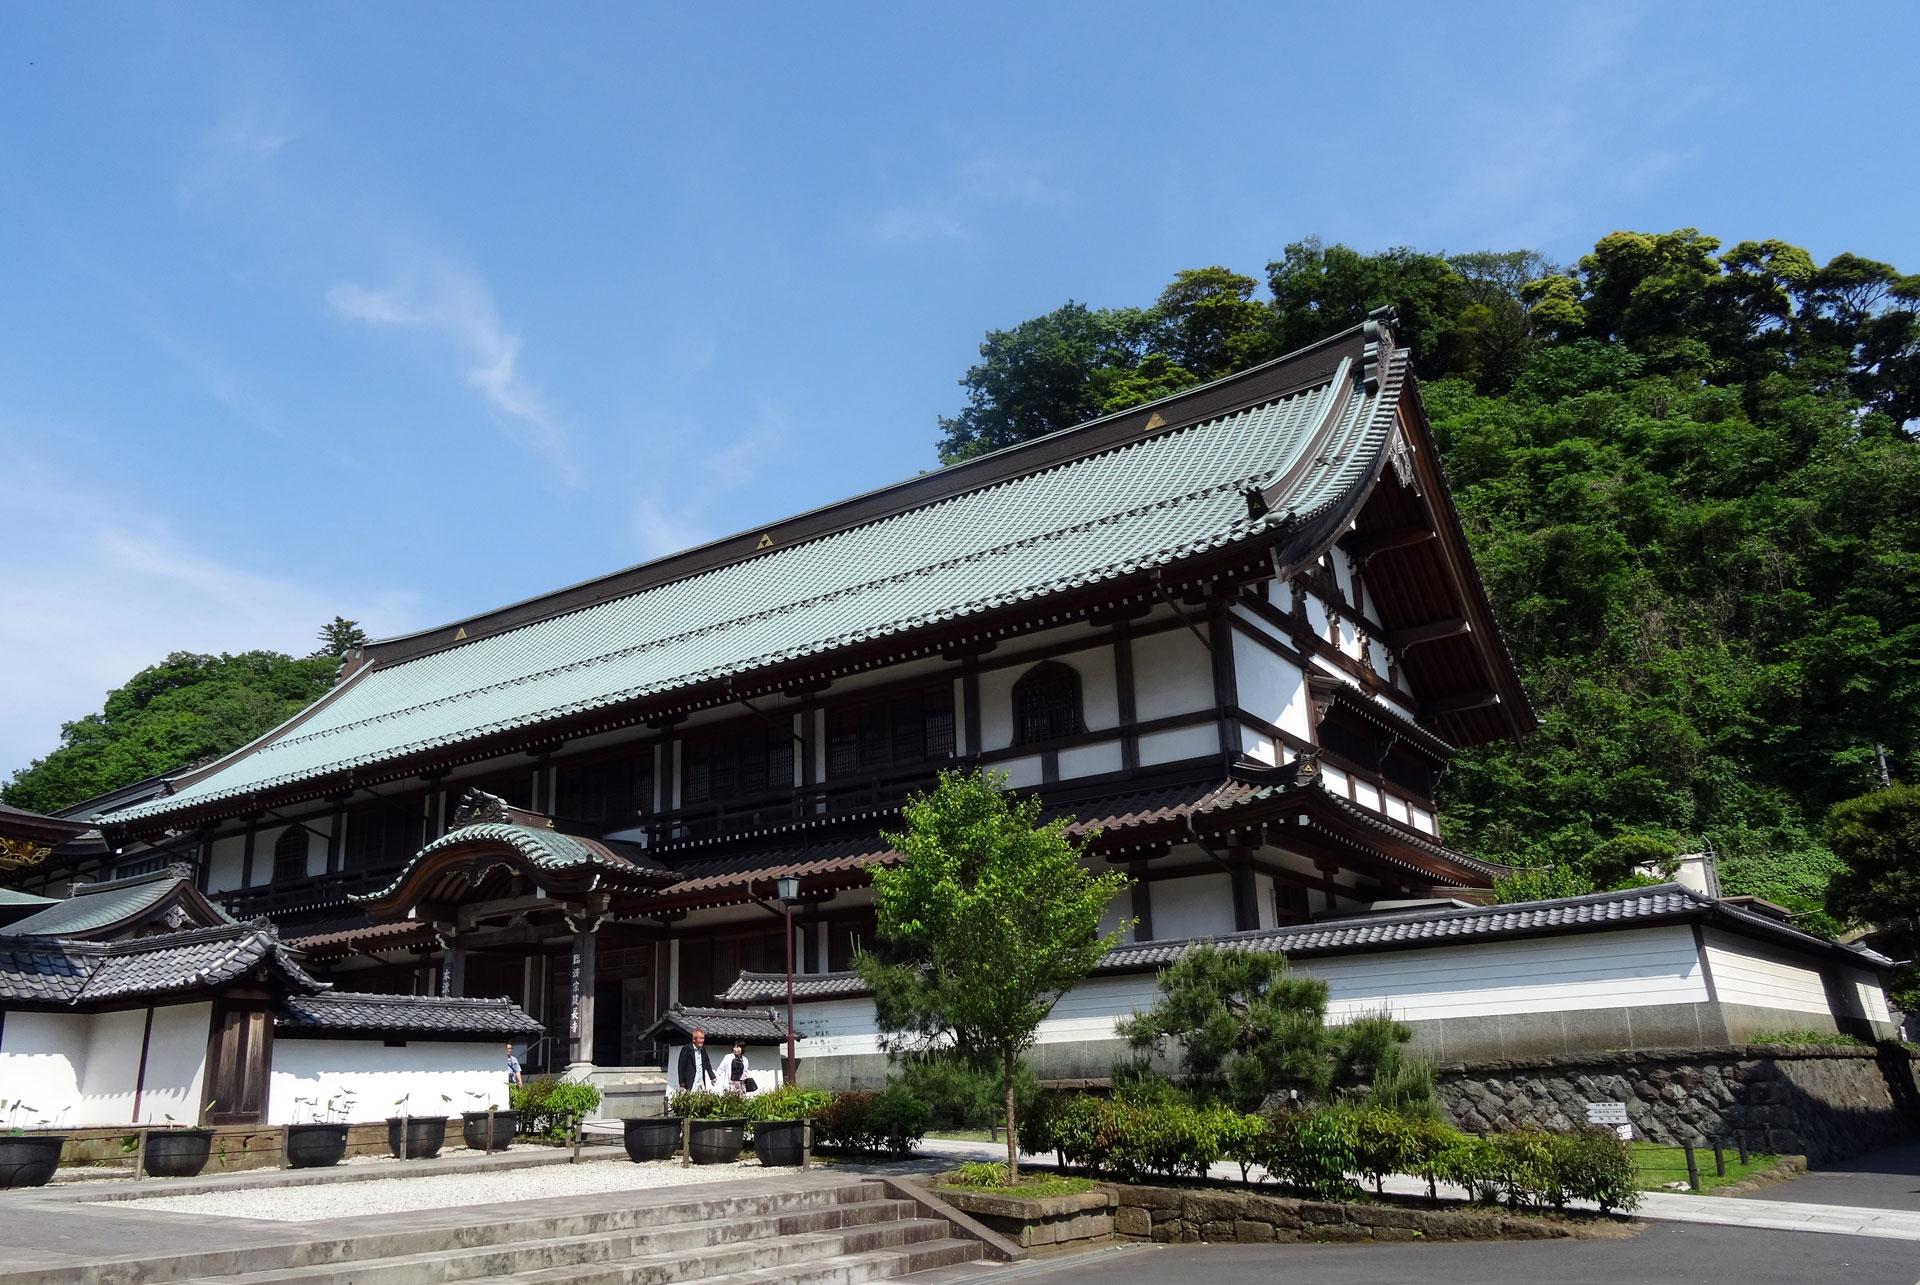 Kamamura